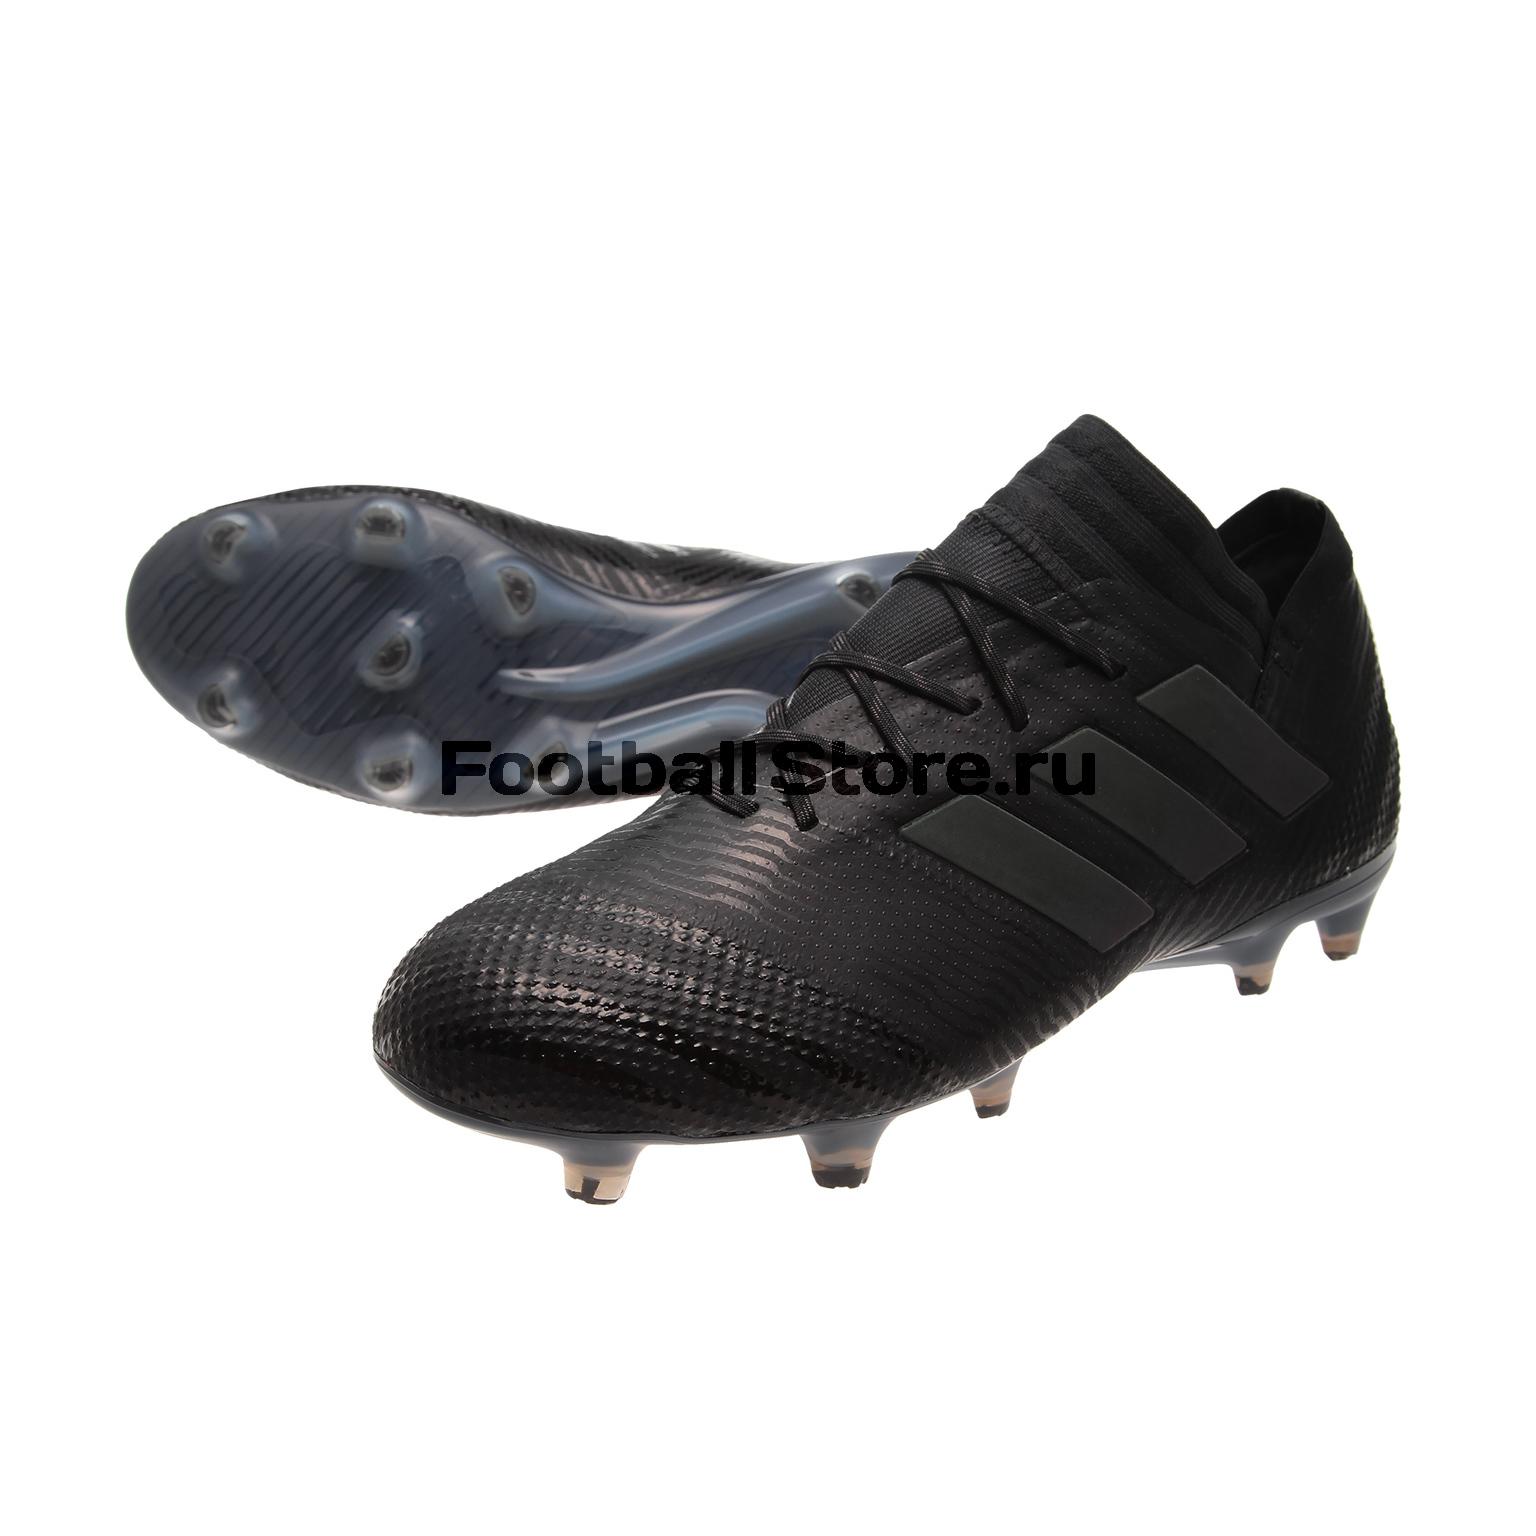 Бутсы Adidas Nemeziz 17.1 FG CP8934 бутсы adidas x 17 1 fg bb6353